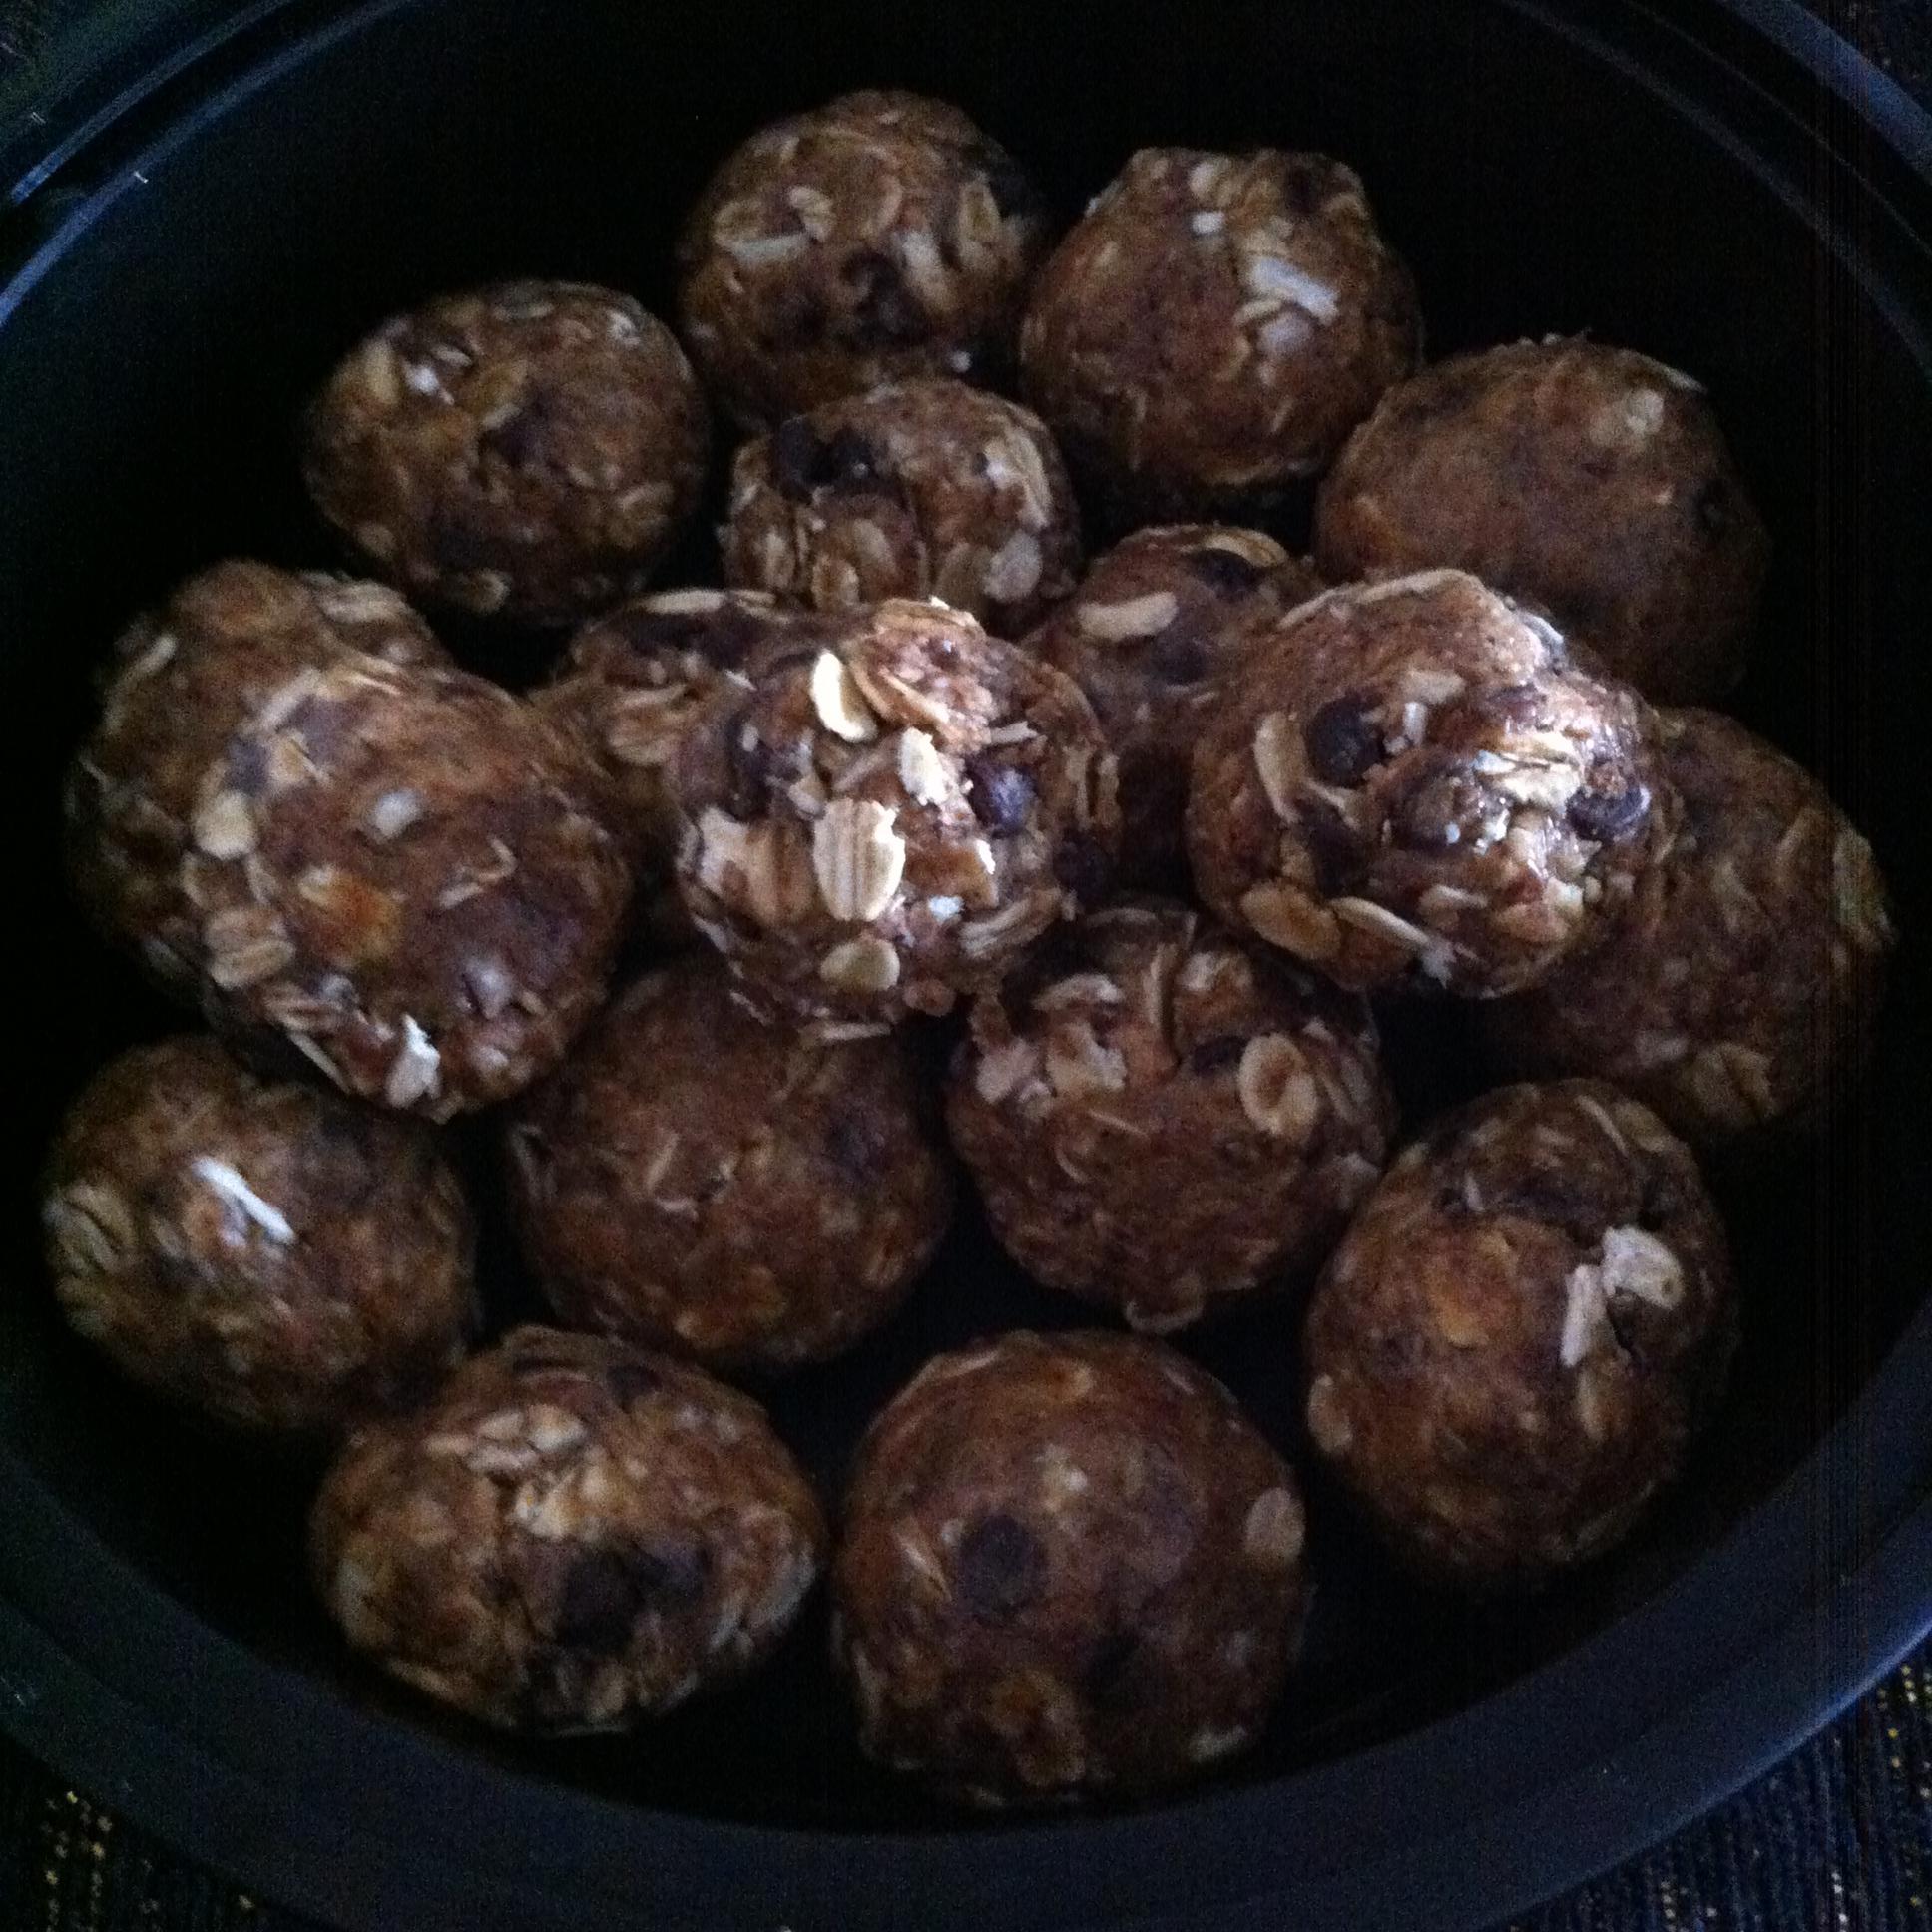 almond+%26+dark+chocolate+energy+balls+%281%29.jpg